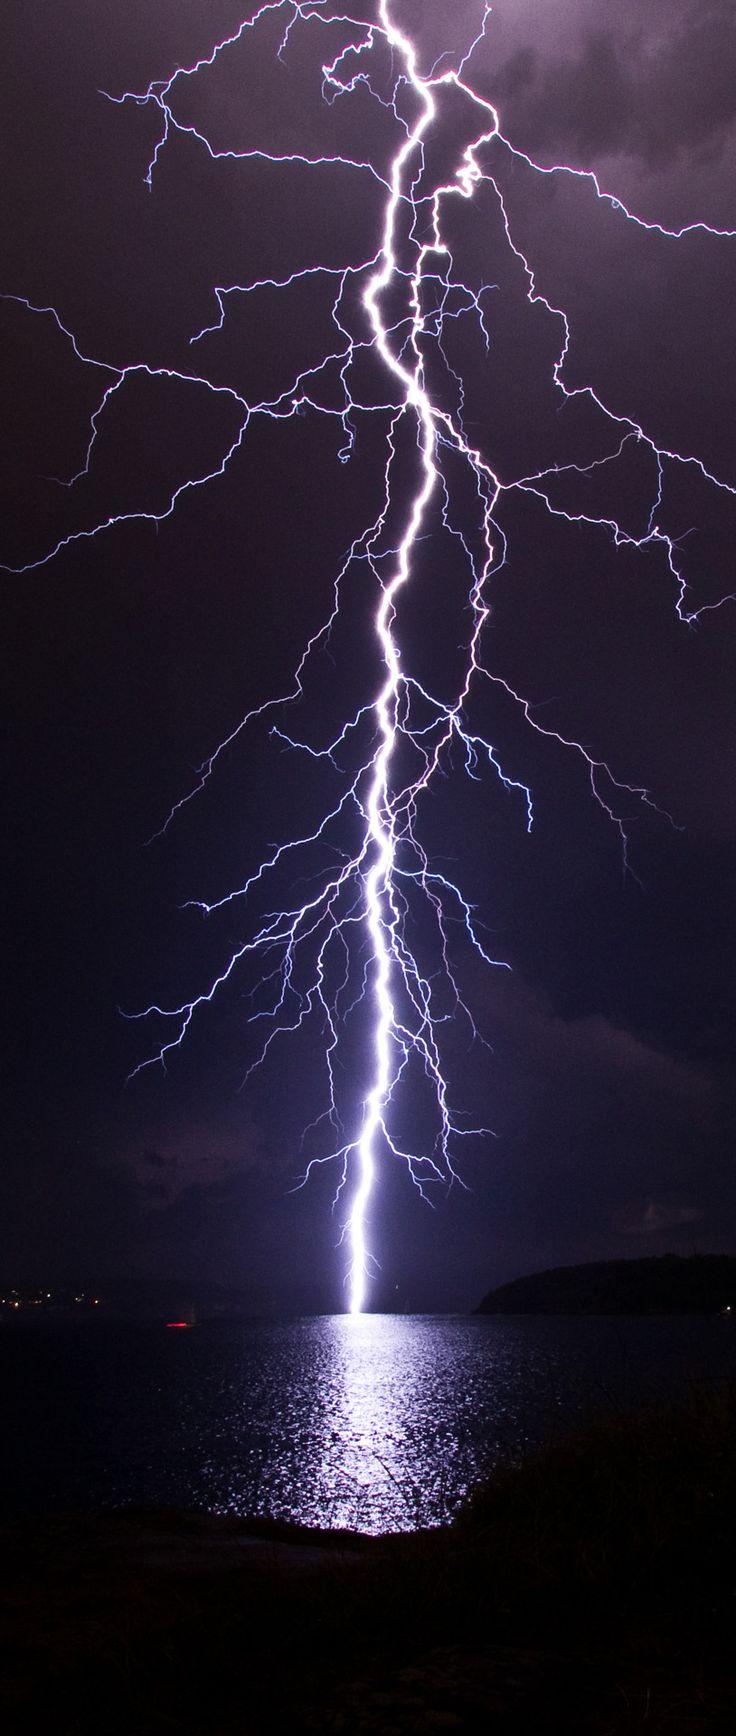 Lightning Strike – Sydney Thunderstorm 8th April 2012 By KAM=//=DHATT via